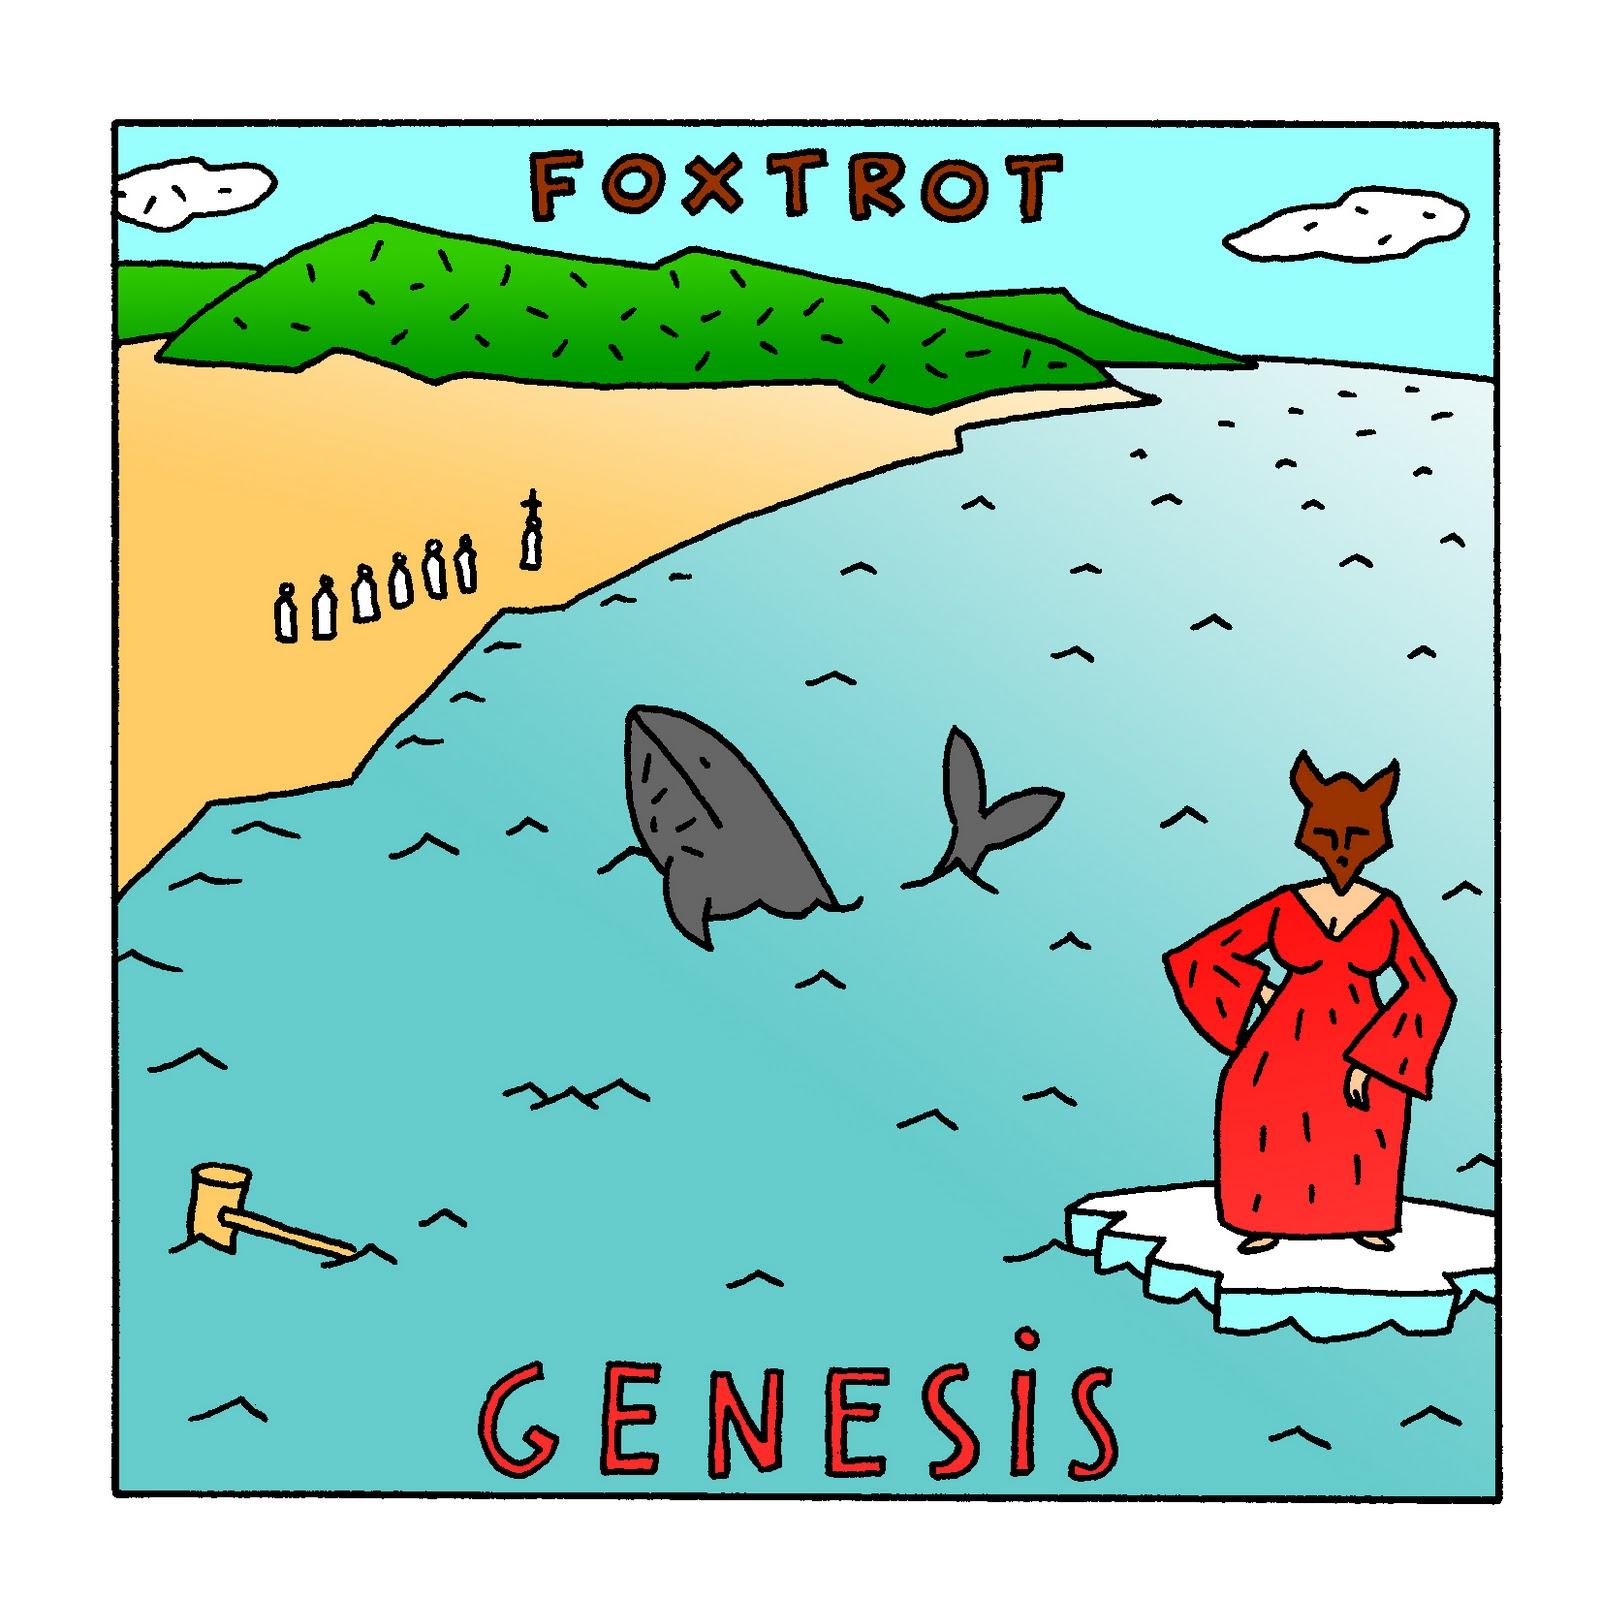 Foxtrot (album)